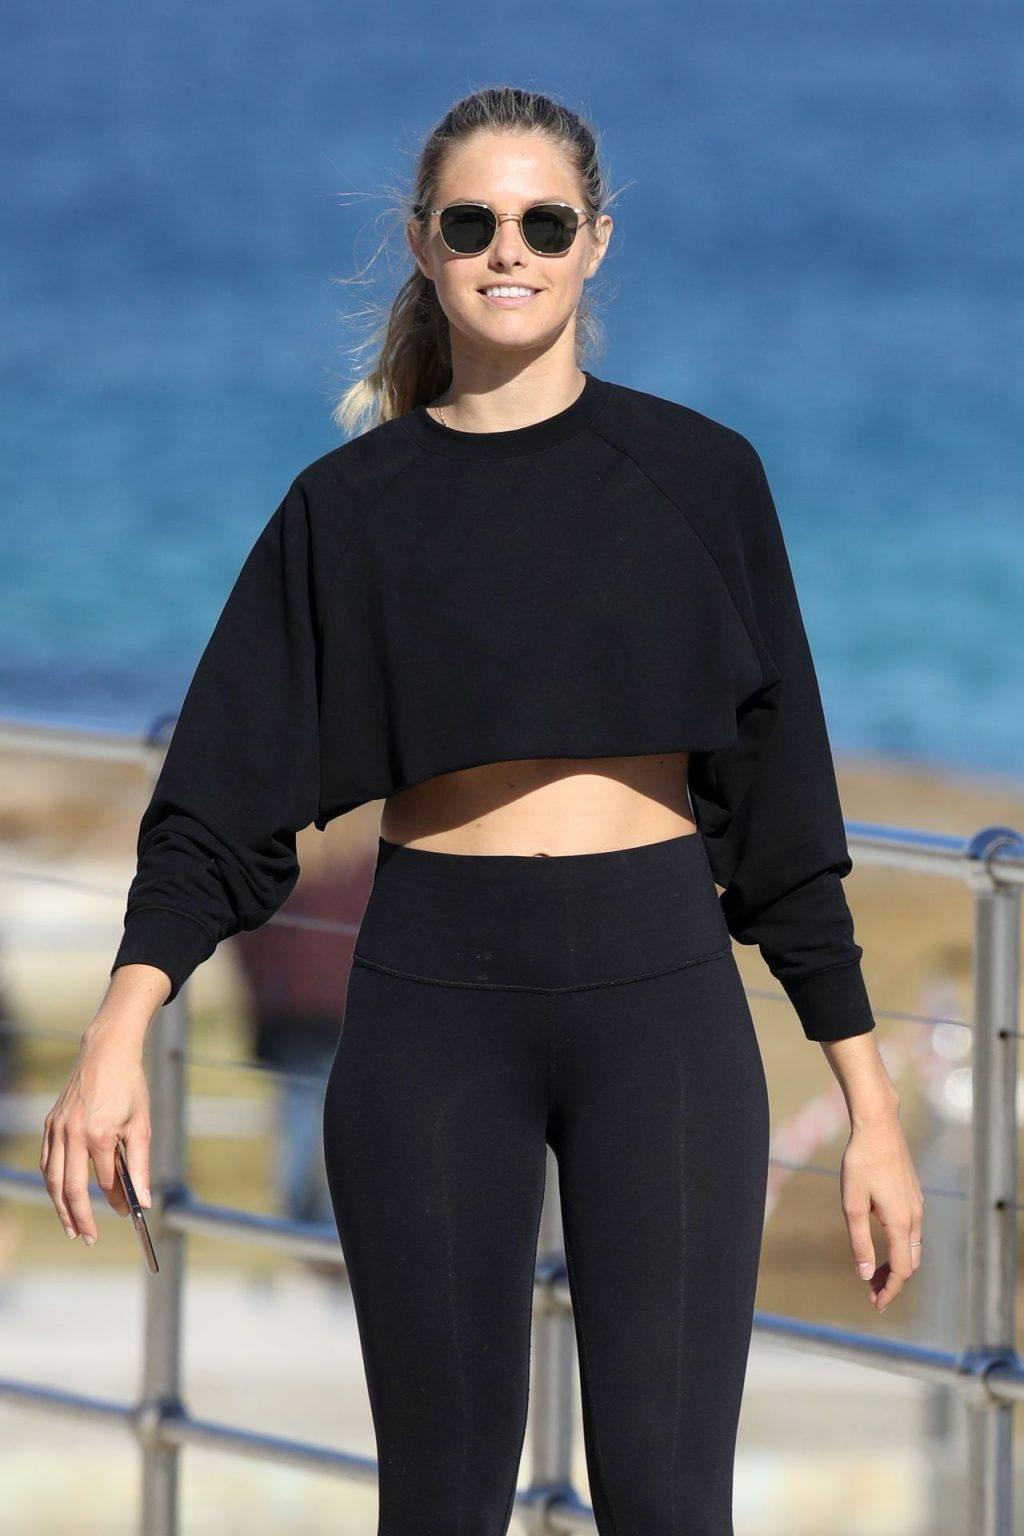 Natalie Roser Displays Her Fit Body in Sydney (28 Photos)